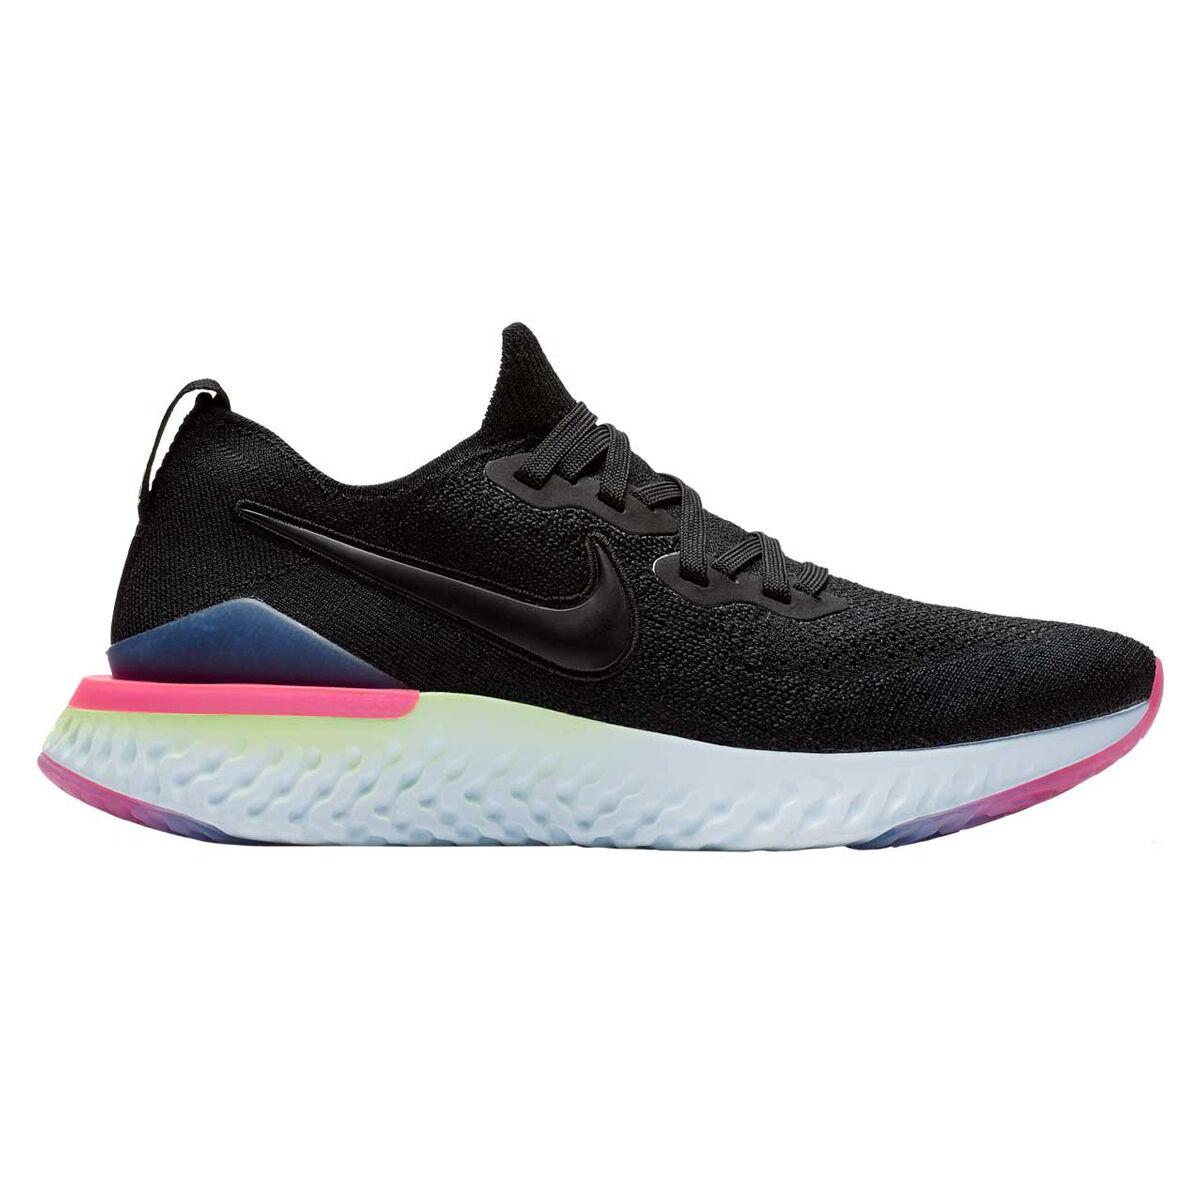 Nike Epic React Flyknit 2 Womens Running Shoes